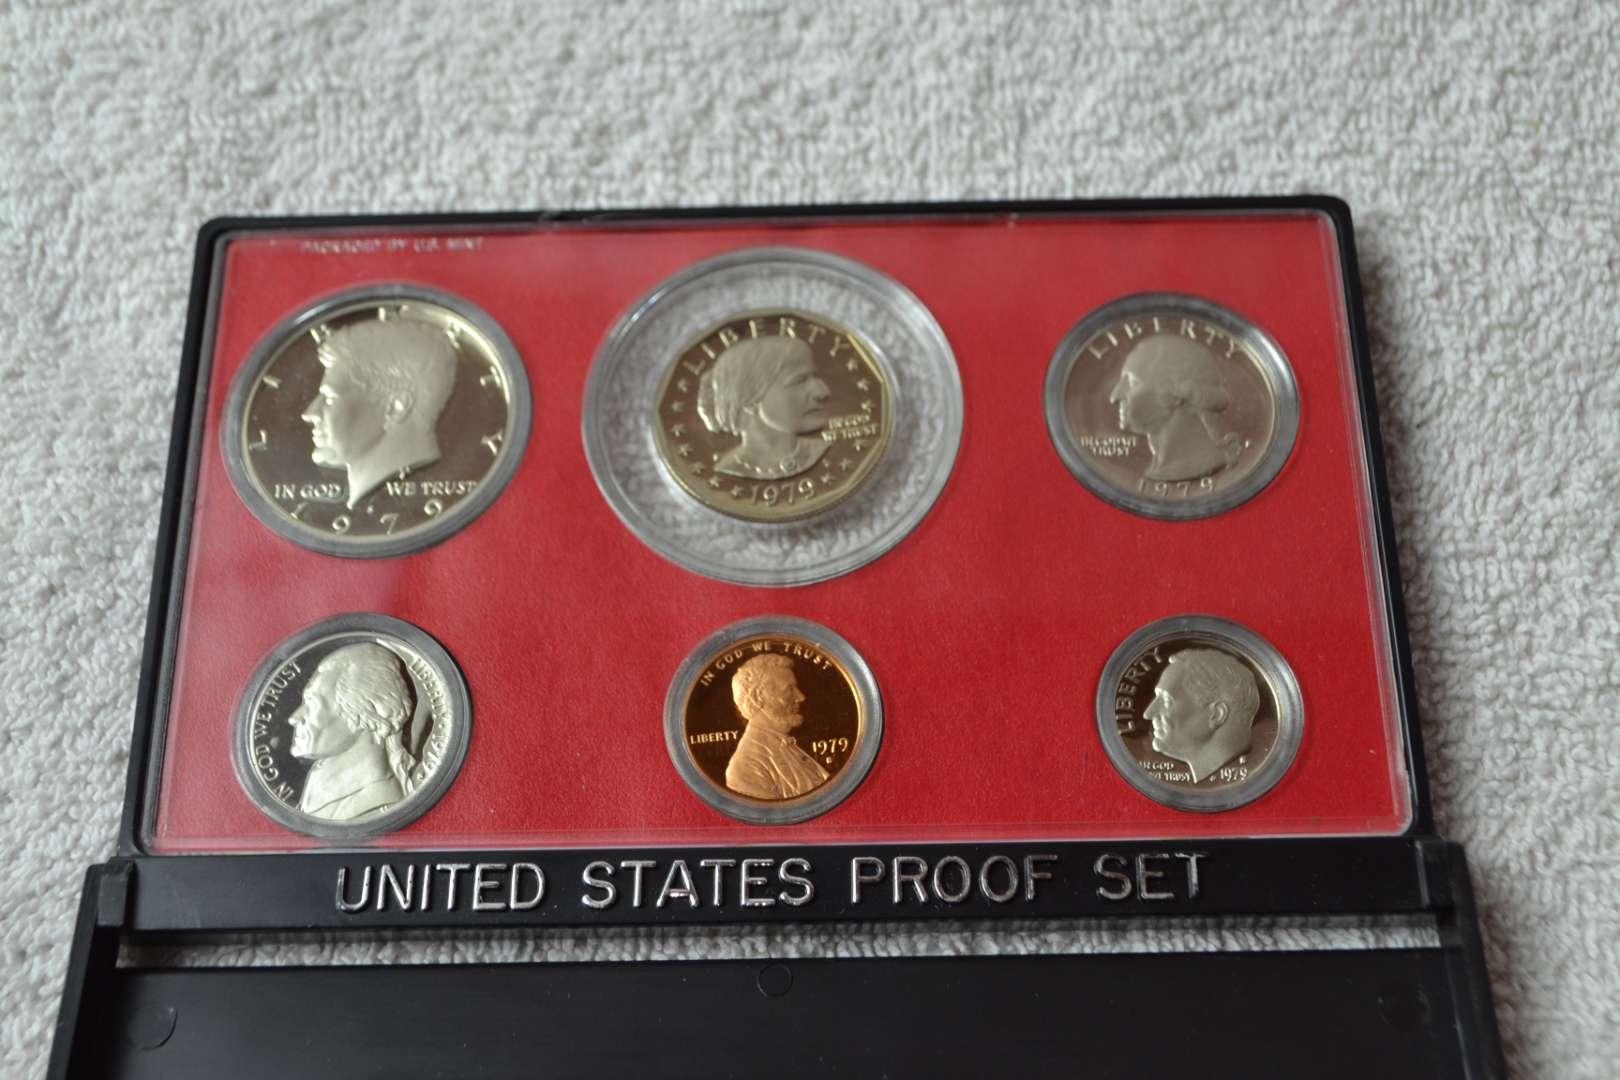 Lot # 193 1979 UNITED STATES PROOF SET